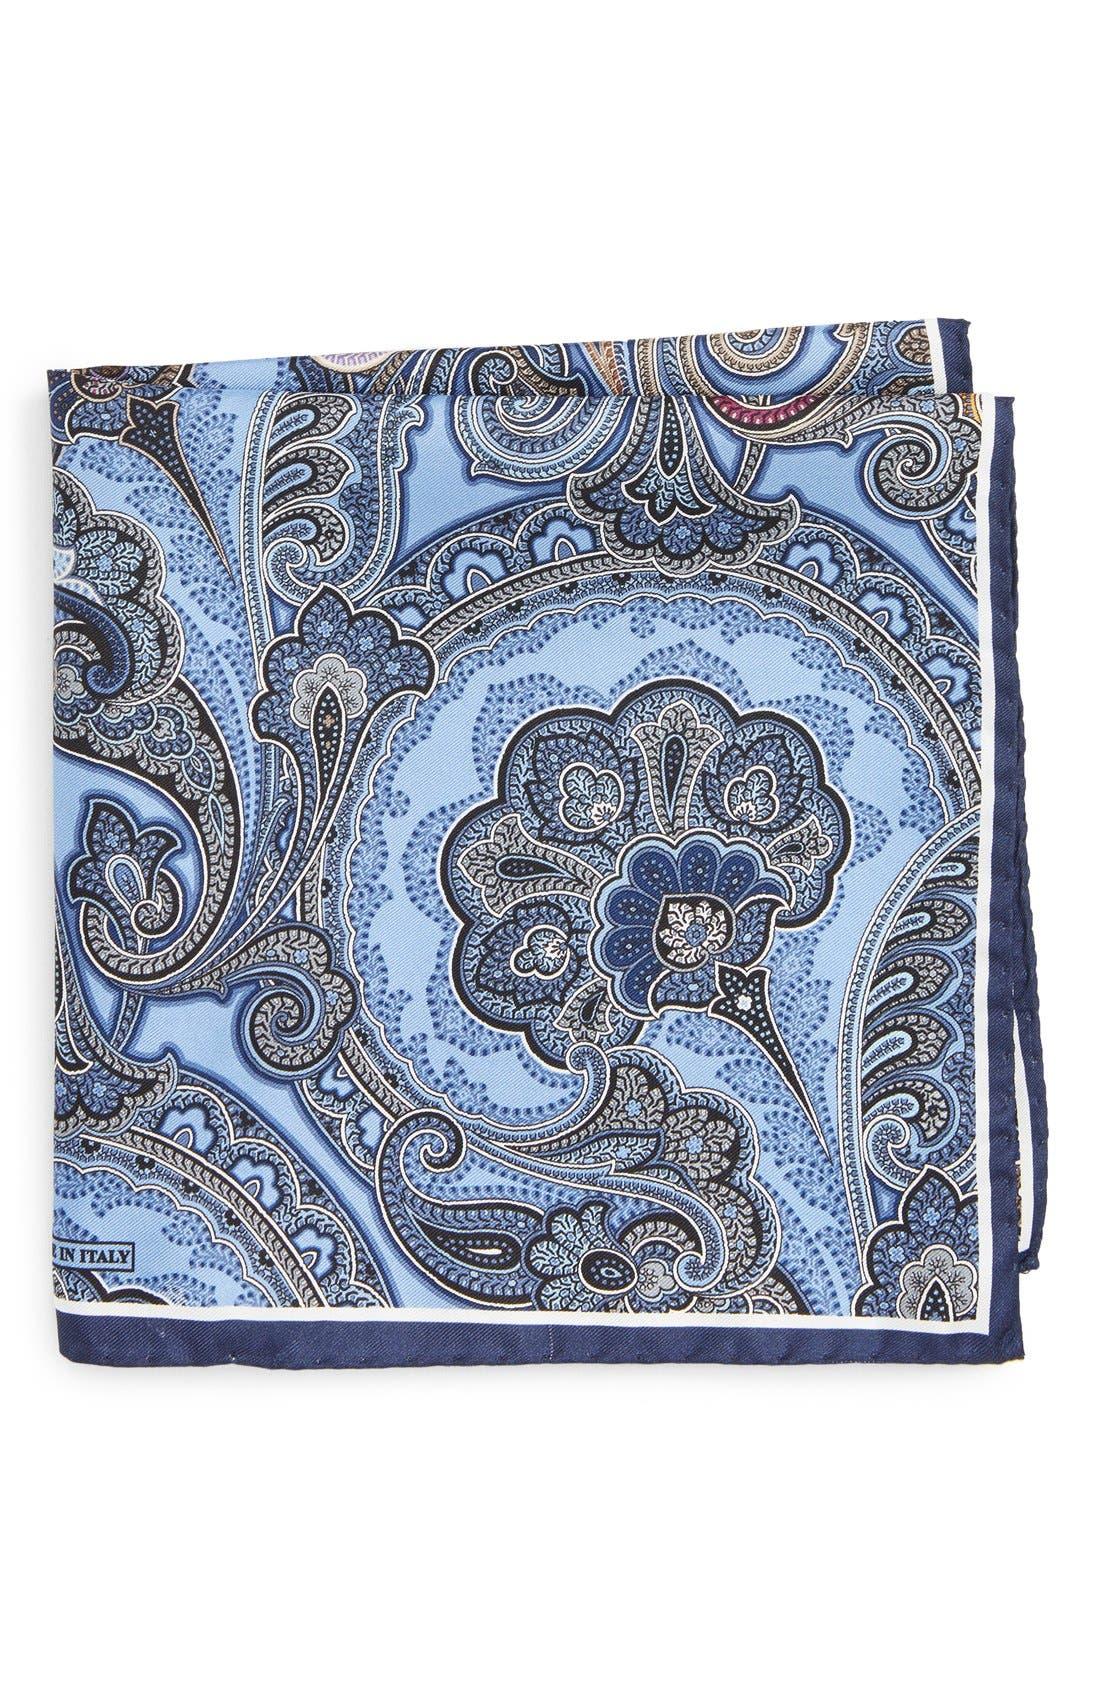 Alternate Image 1 Selected - Nordstrom Men's Shop Paisley Silk Pocket Square